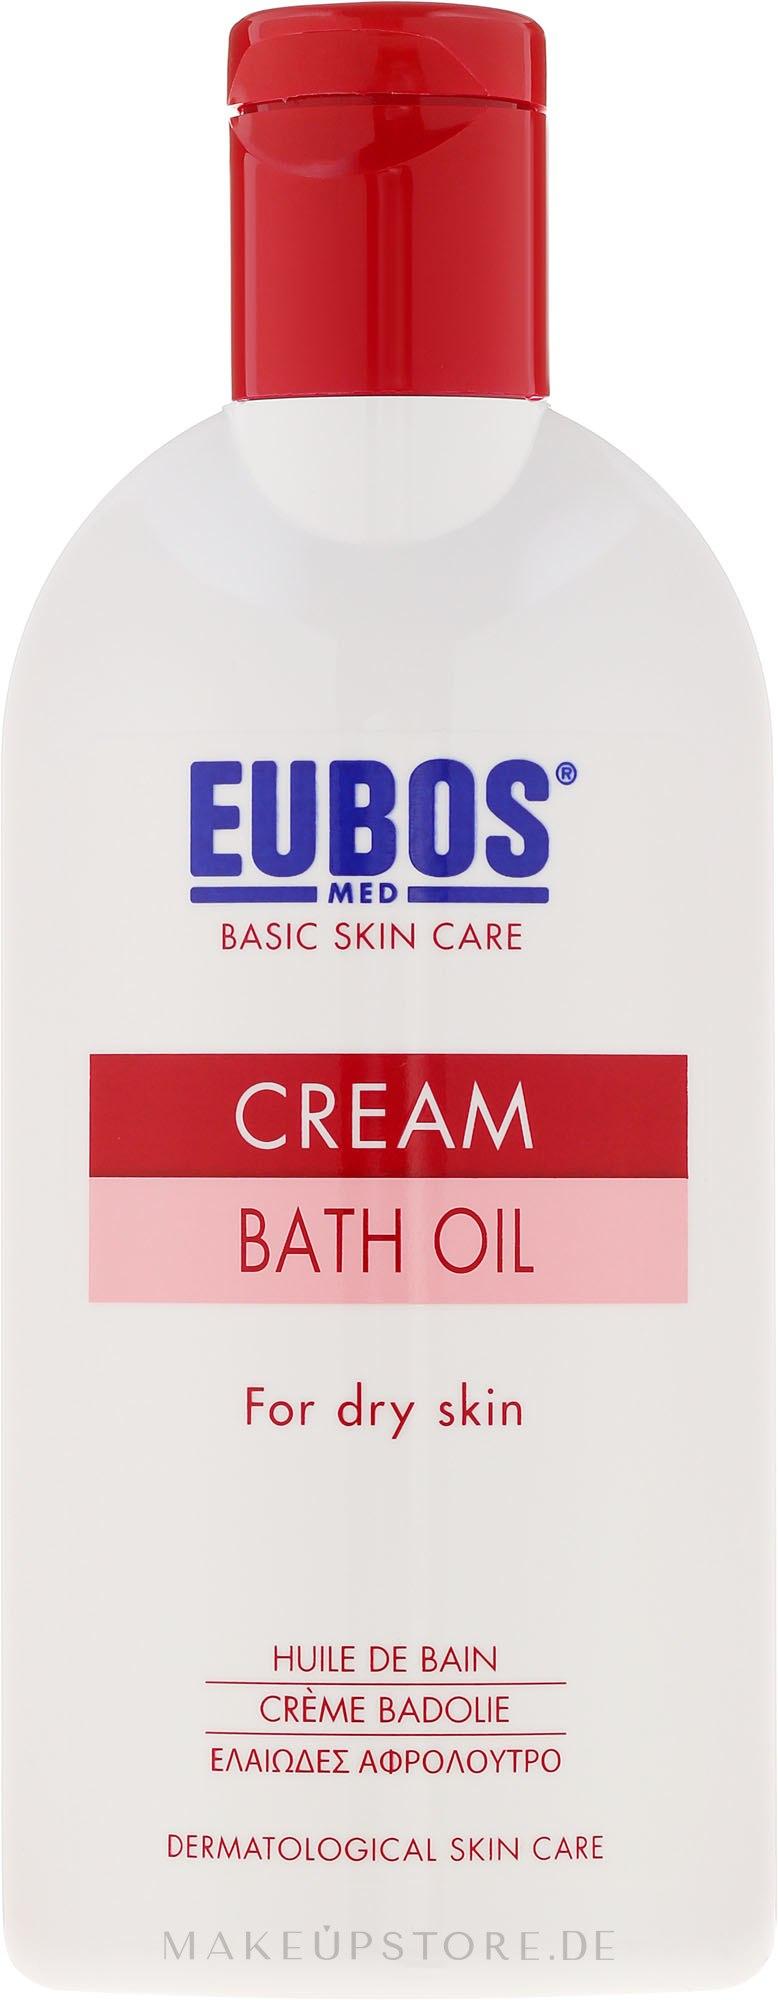 Badeöl für trockene Haut - Eubos Med Basic Skin Care Cream Bath Oil For Dry Skin — Bild 200 ml